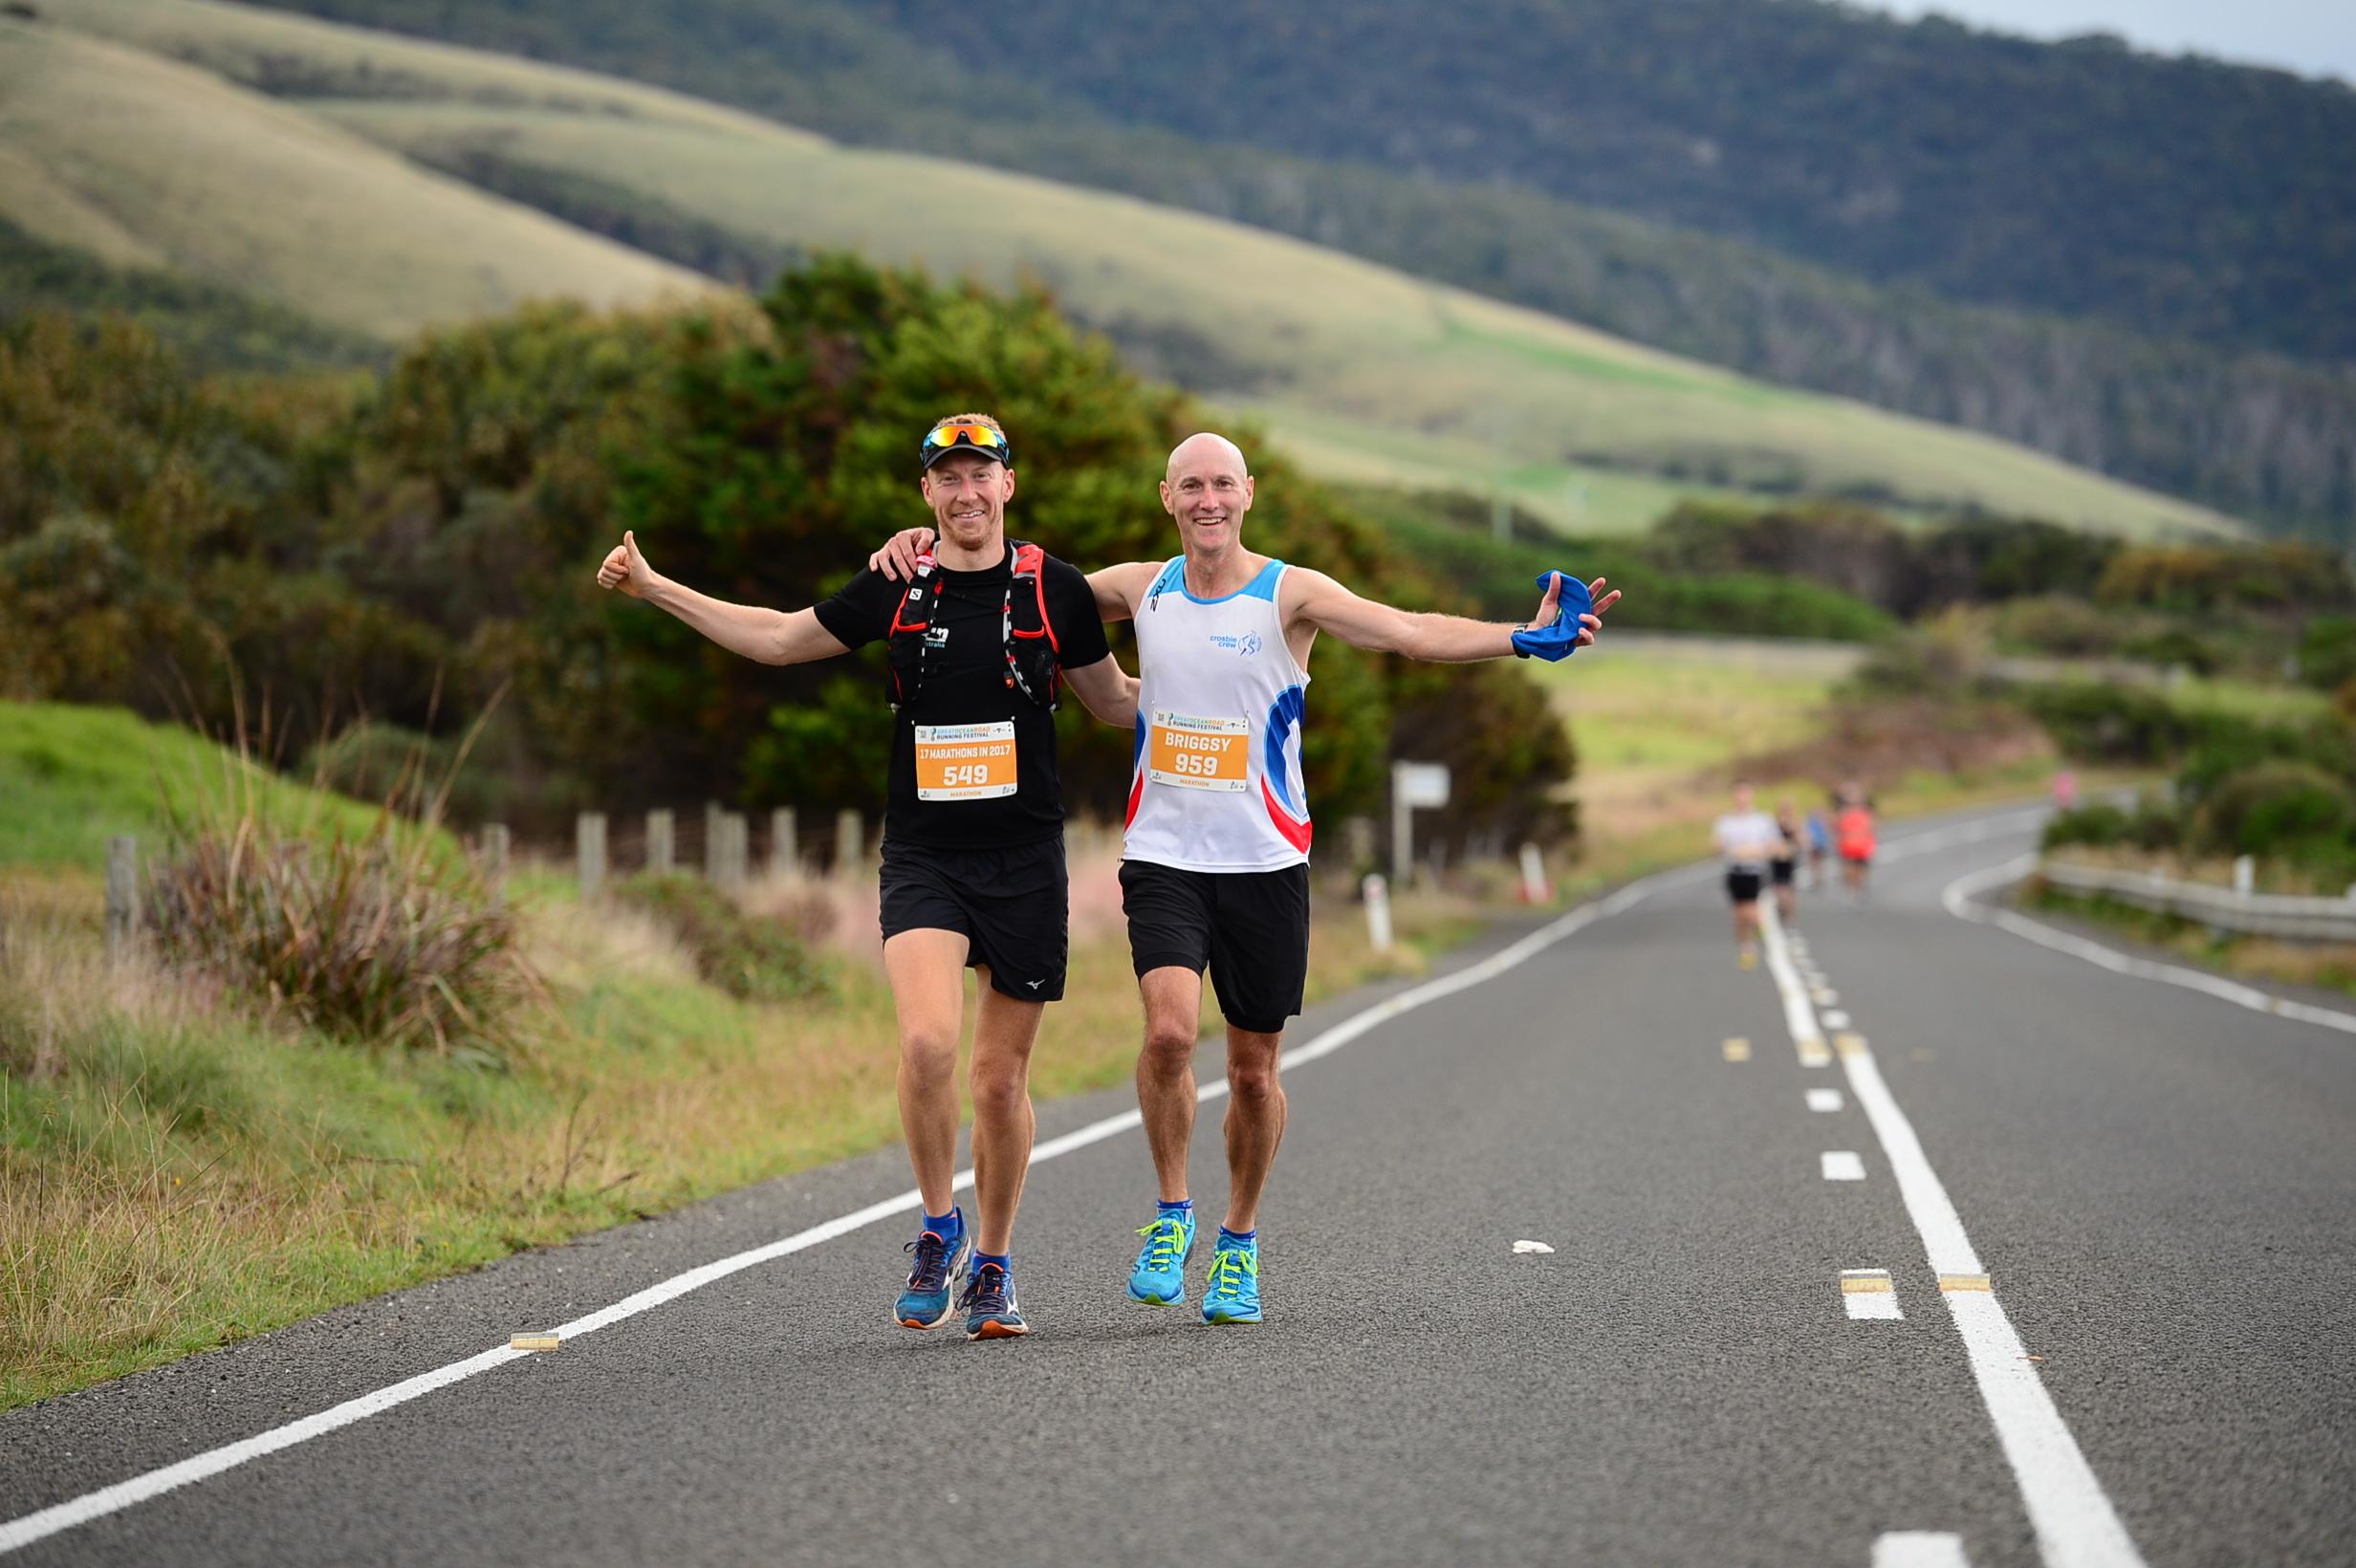 07 Great Ocean Road Marathon_1.jpg